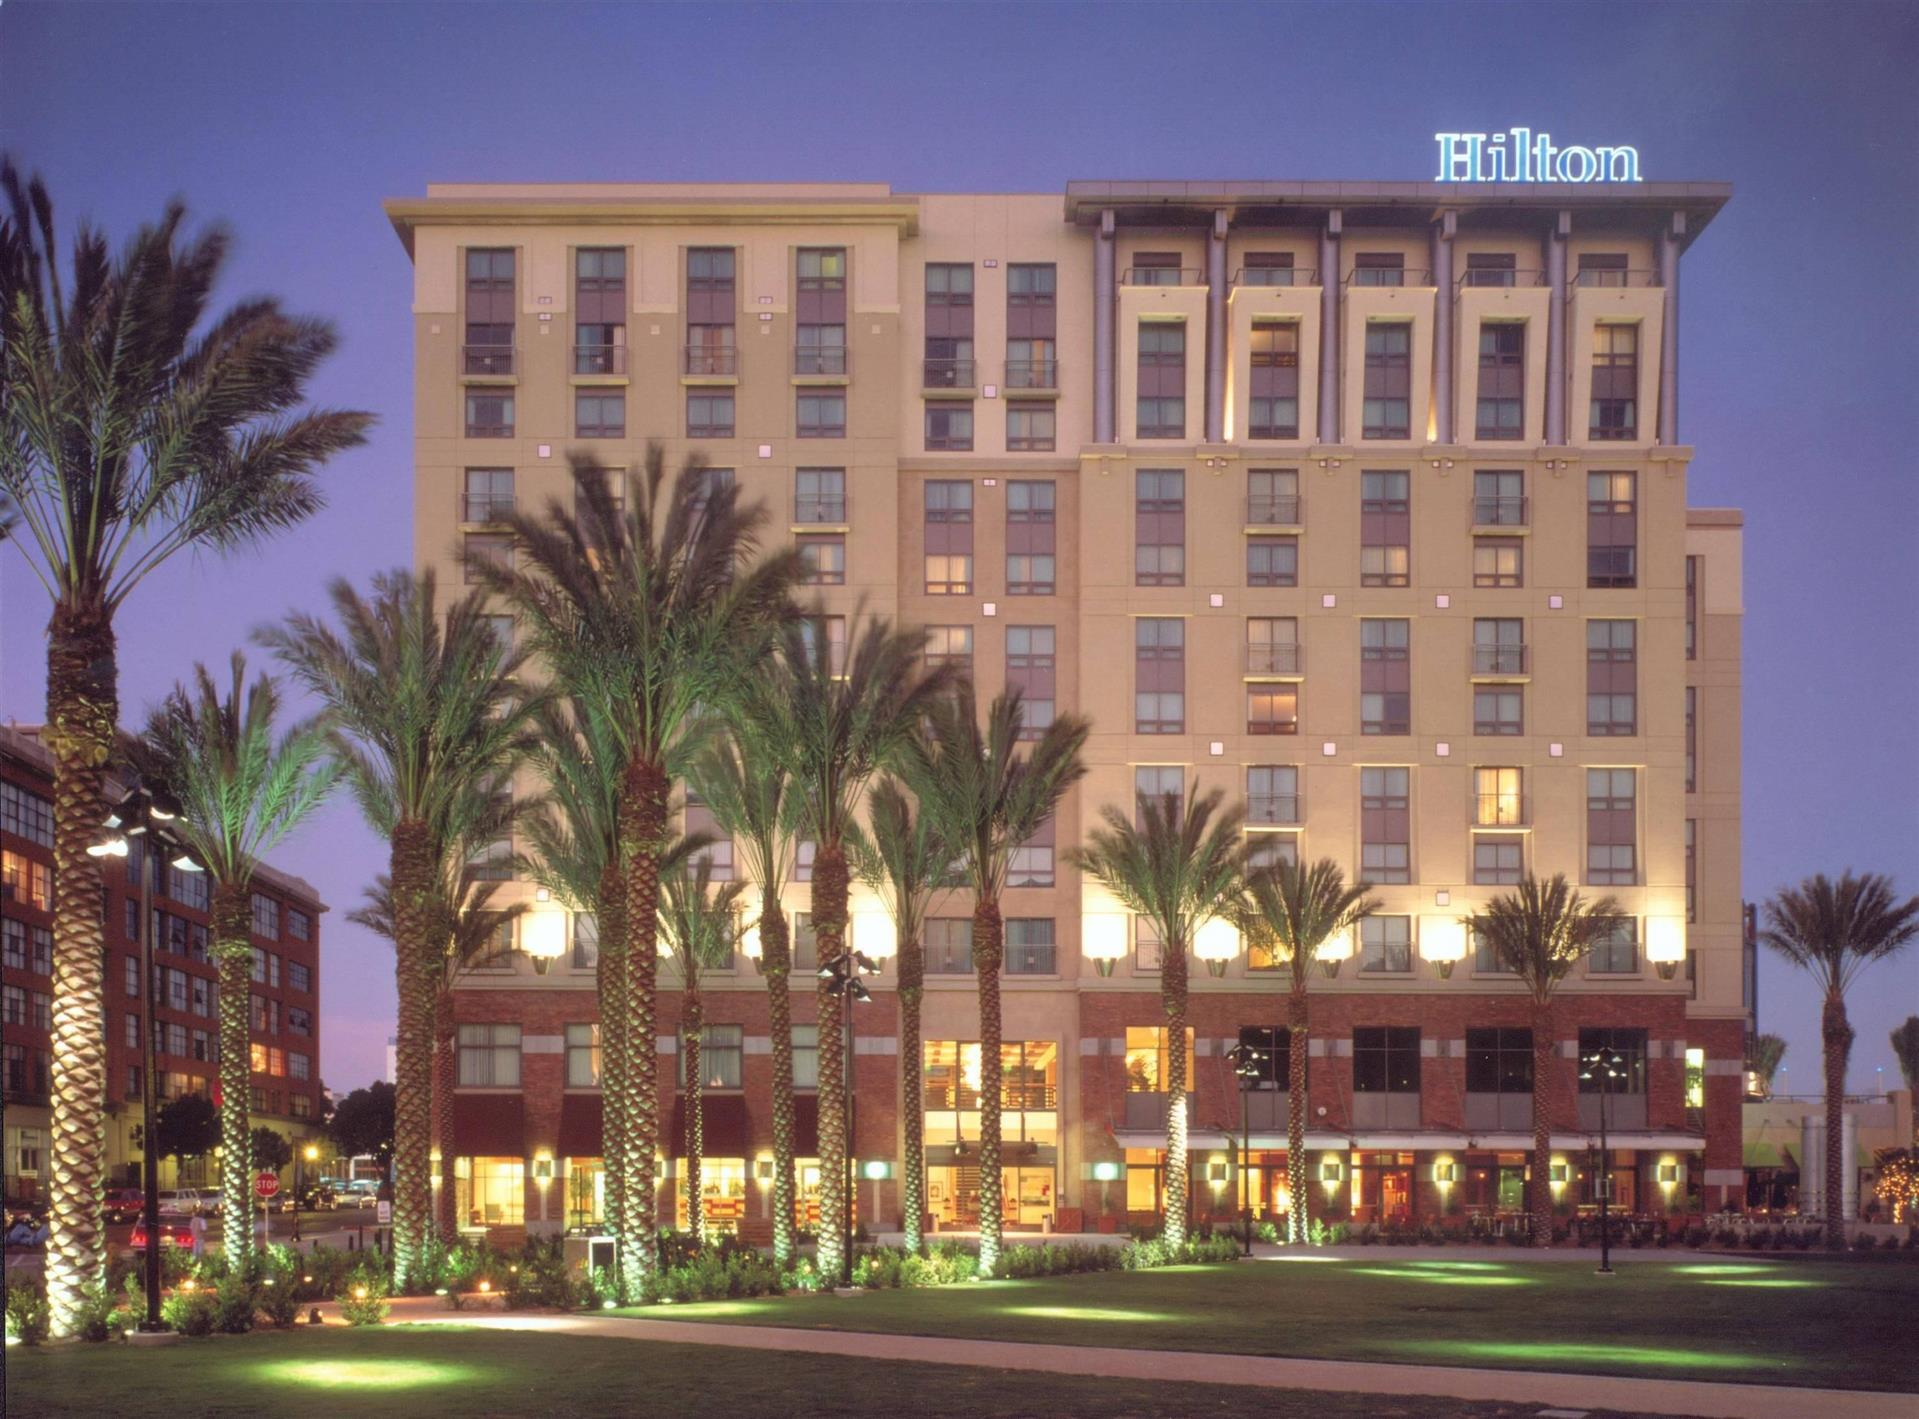 Meetings and Events at Hilton San Diego Gaslamp Quarter, San Diego ...